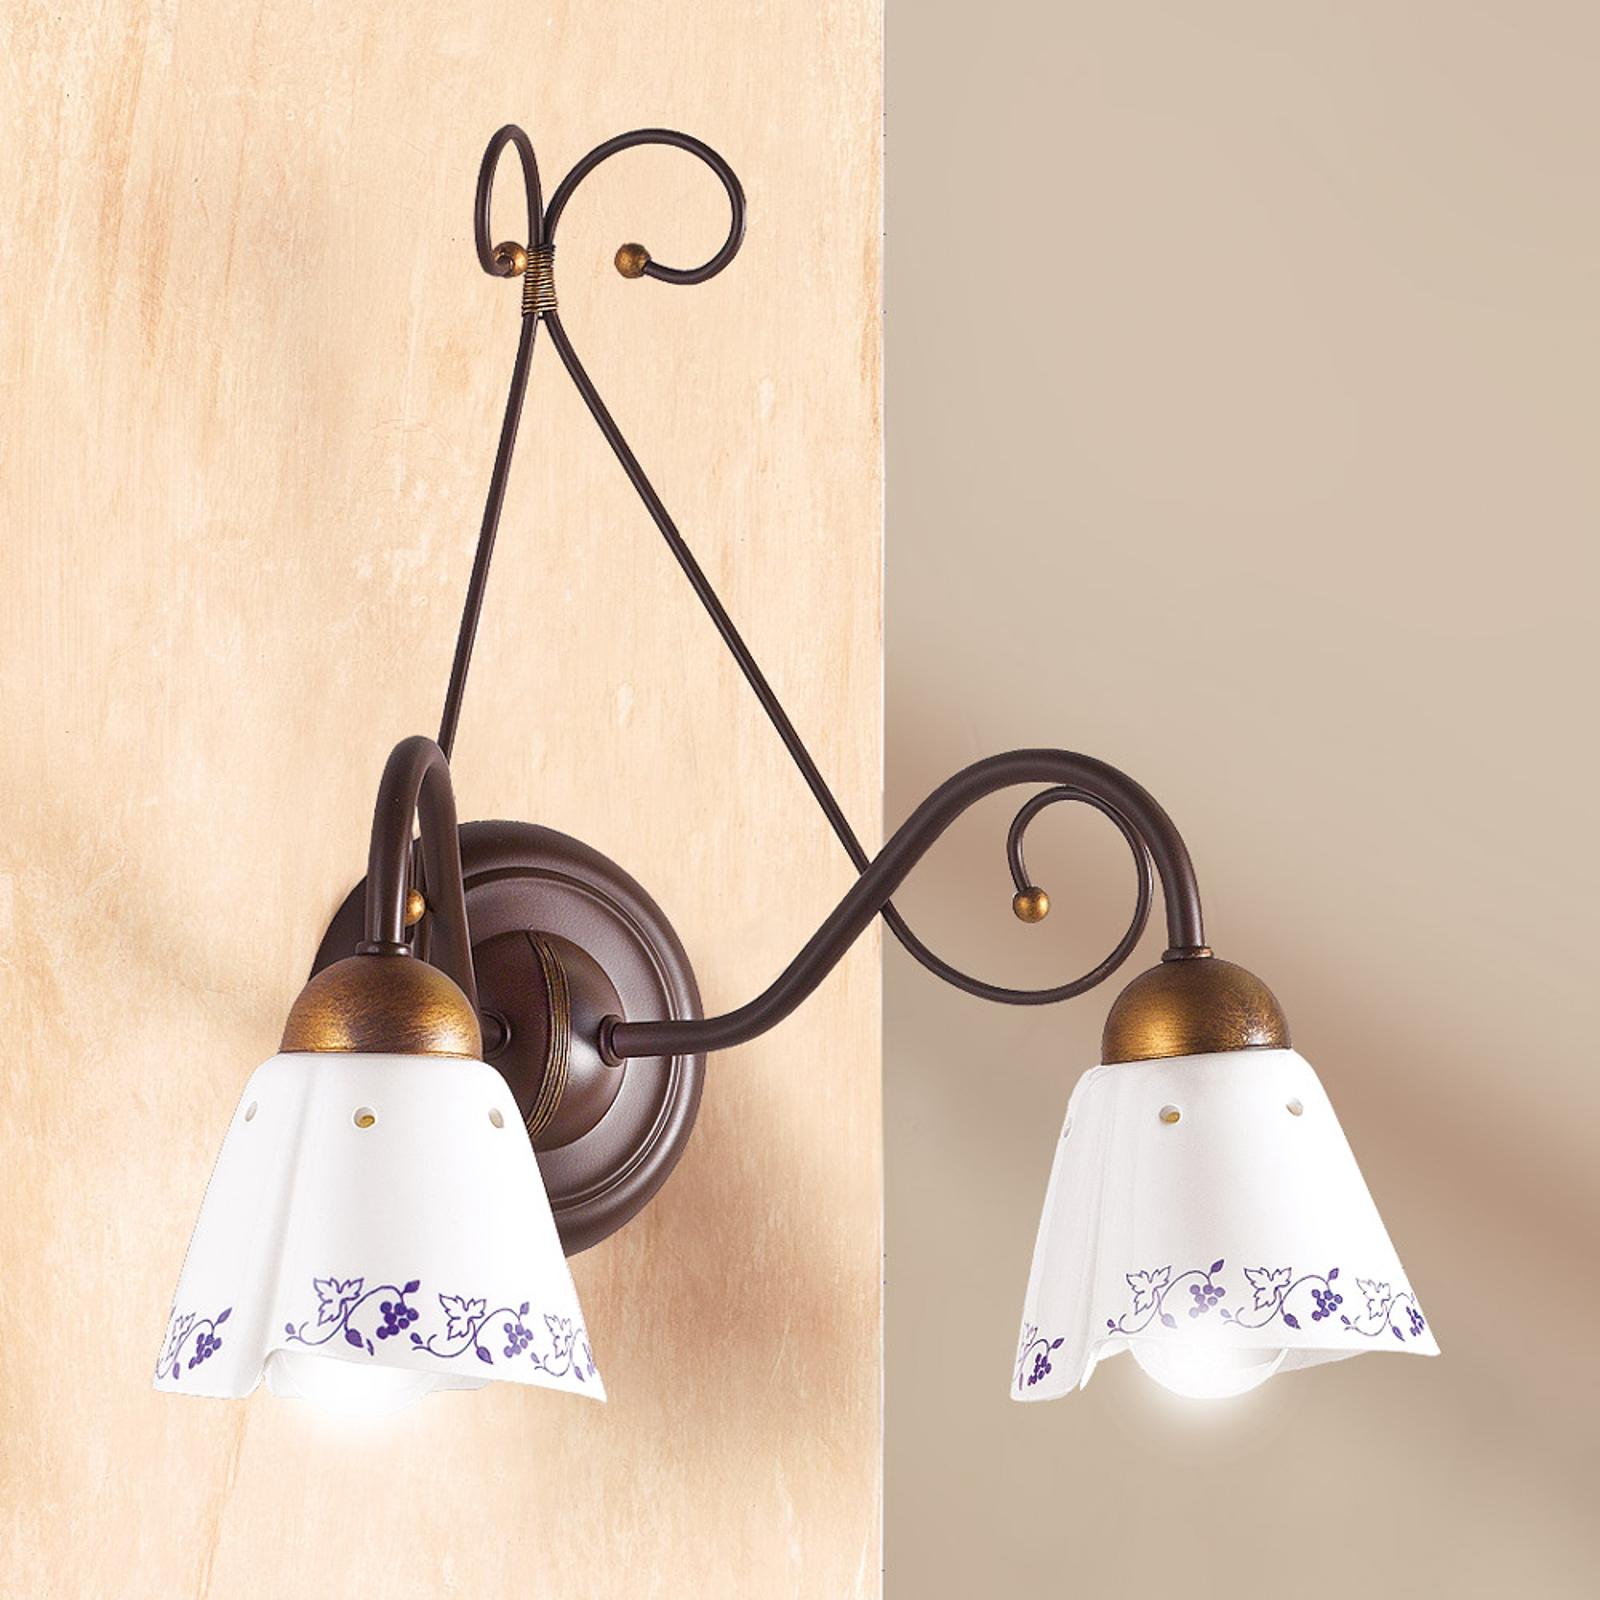 Wandlamp CARTOCCIO, 2-lichts